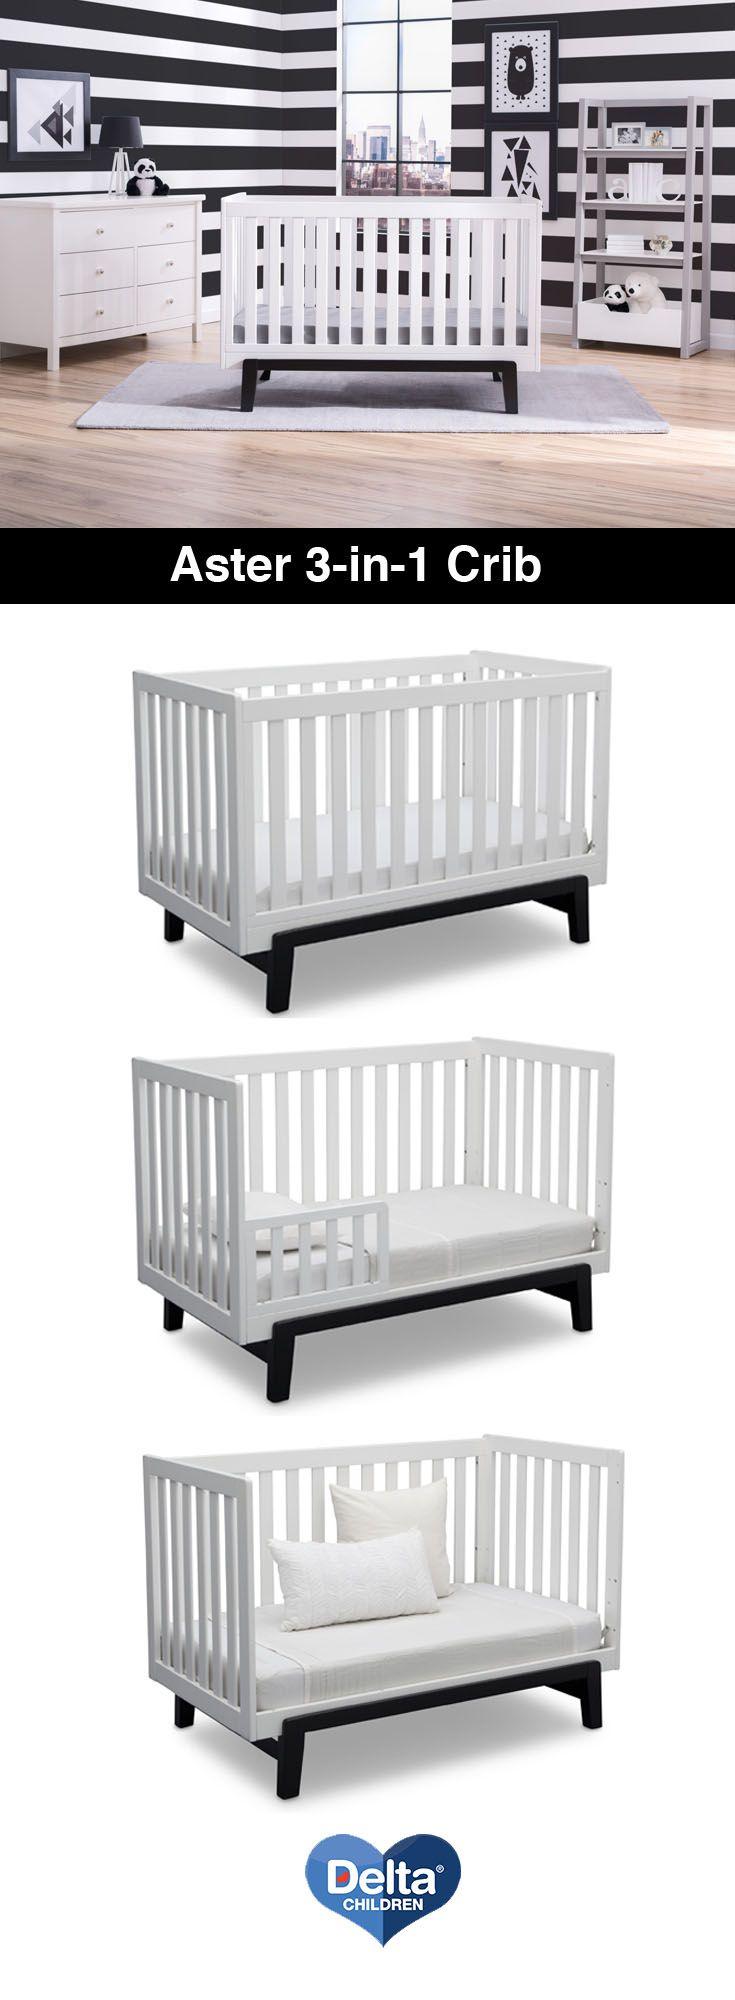 Used crib for sale dallas - Delta Children Aster 3 In 1 Convertible Crib Bianca With Ebony